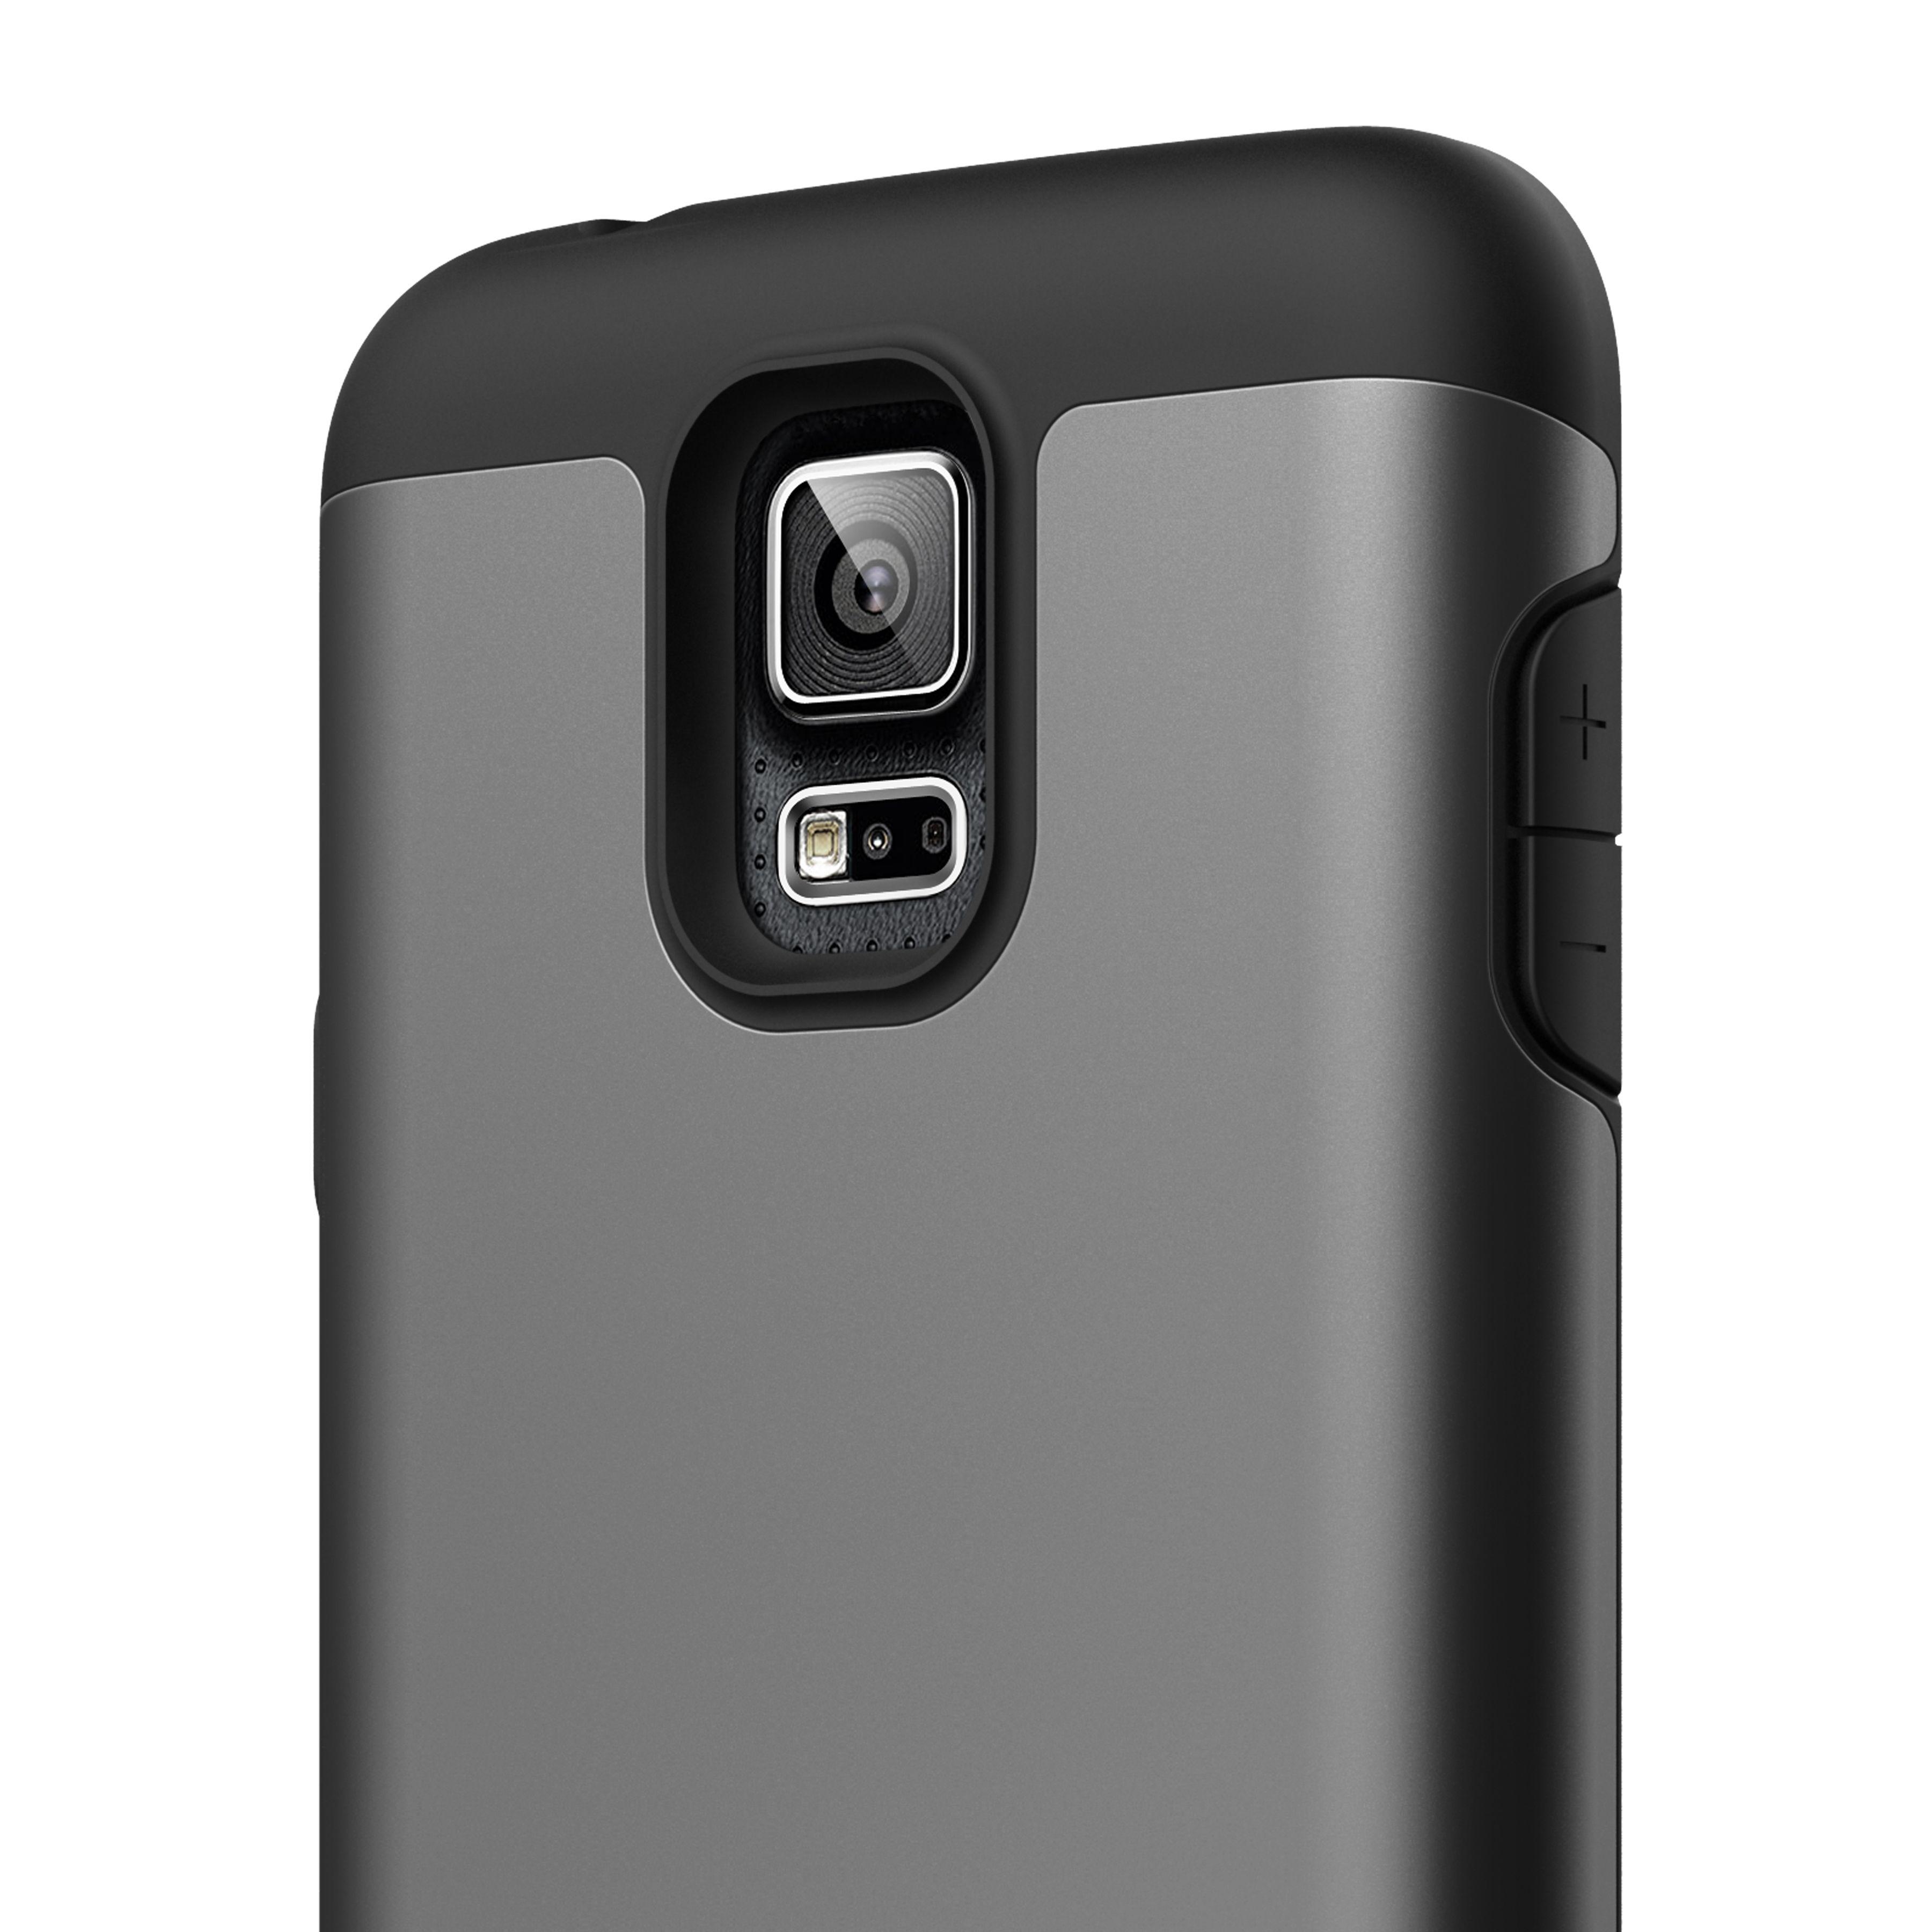 cheaper a124b 5cd47 elago Duro Case for Samsung Galaxy S5 - Black/Metallic Dark Gray ...